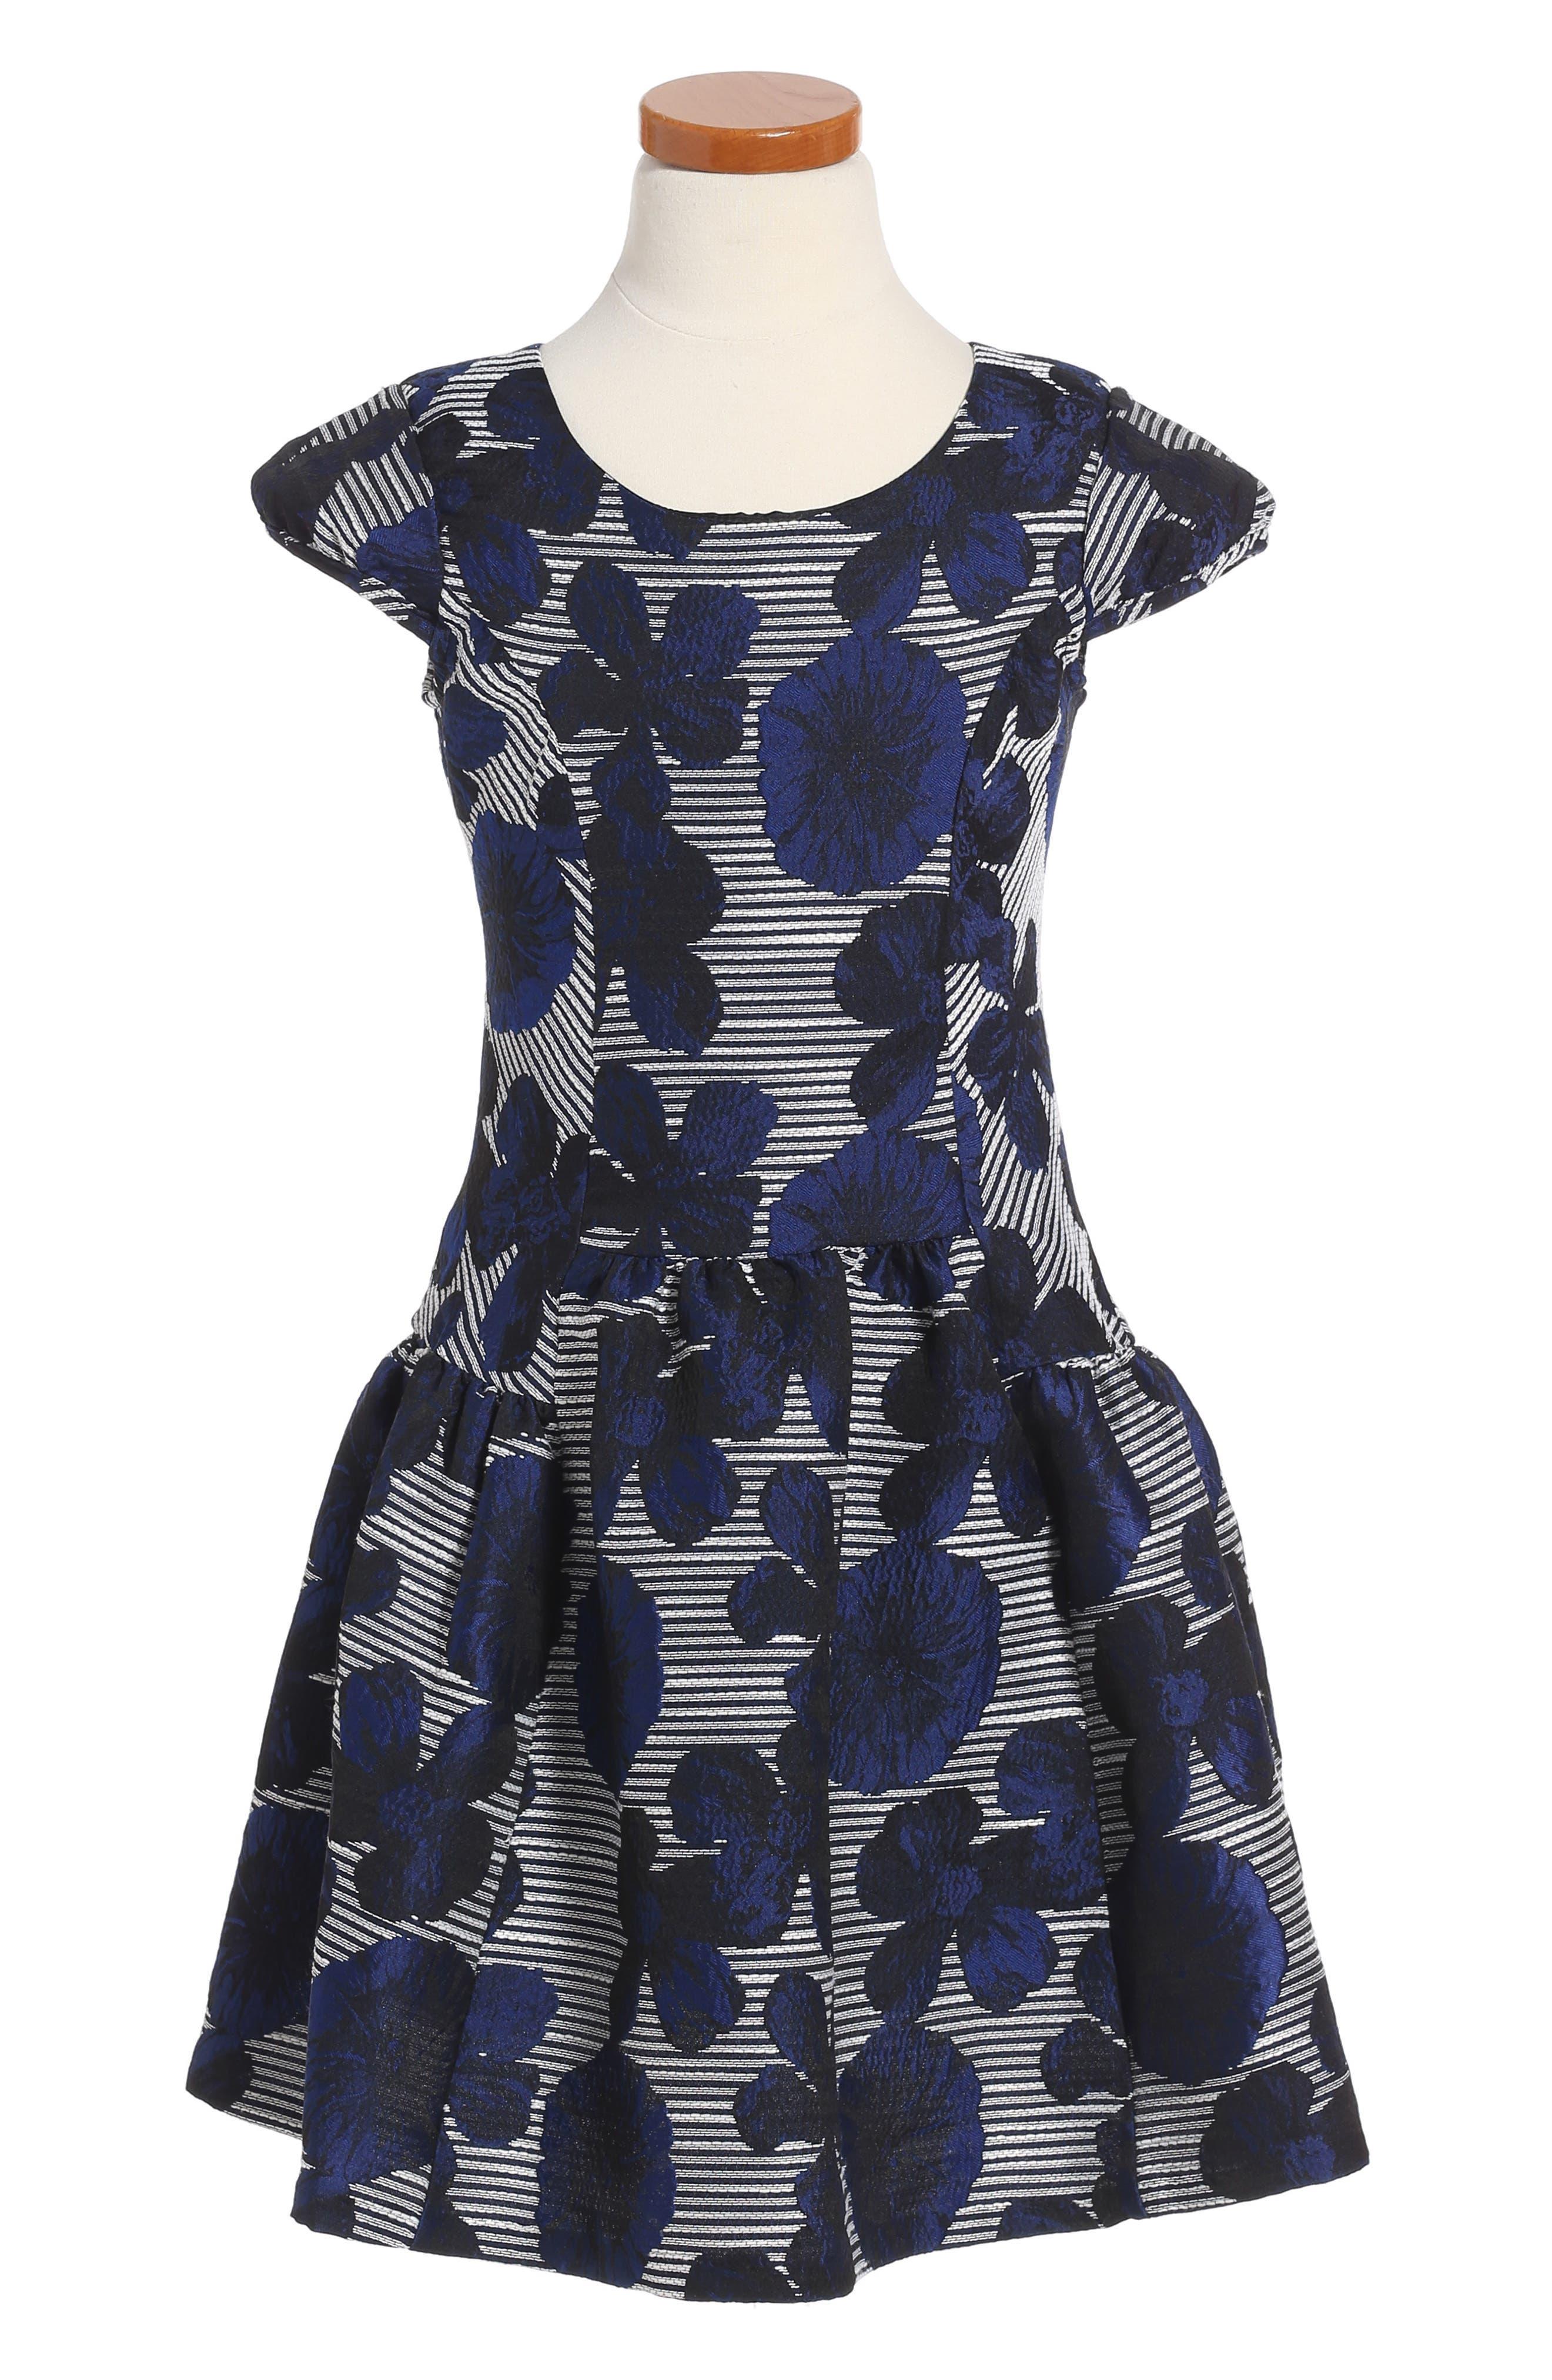 Alternate Image 1 Selected - Iris & Ivy Floral Jacquard Dress (Toddler Girls, Little Girls & Big Girls)